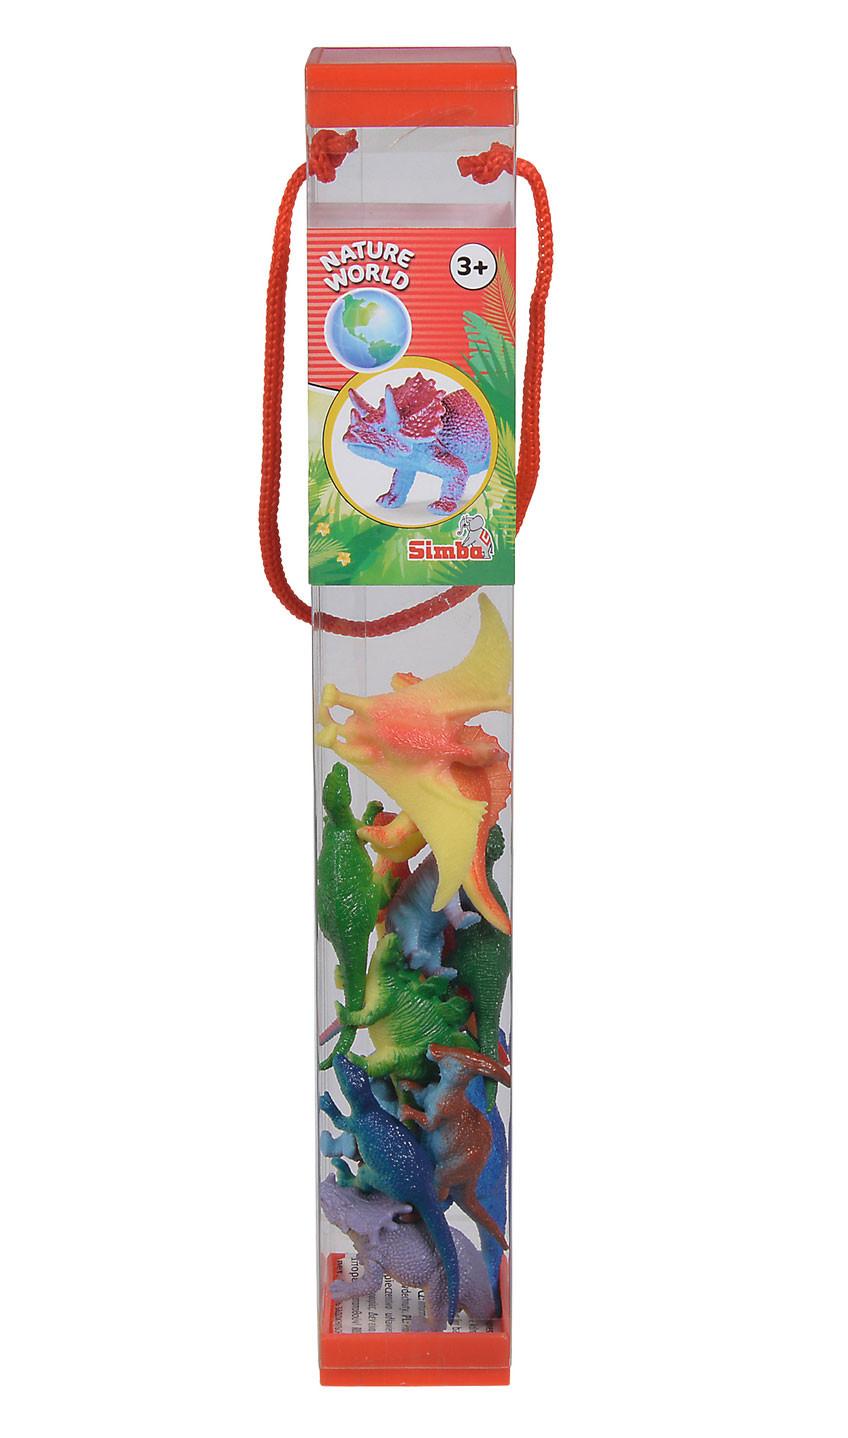 Set Animales en Tubo - Dinosaurios